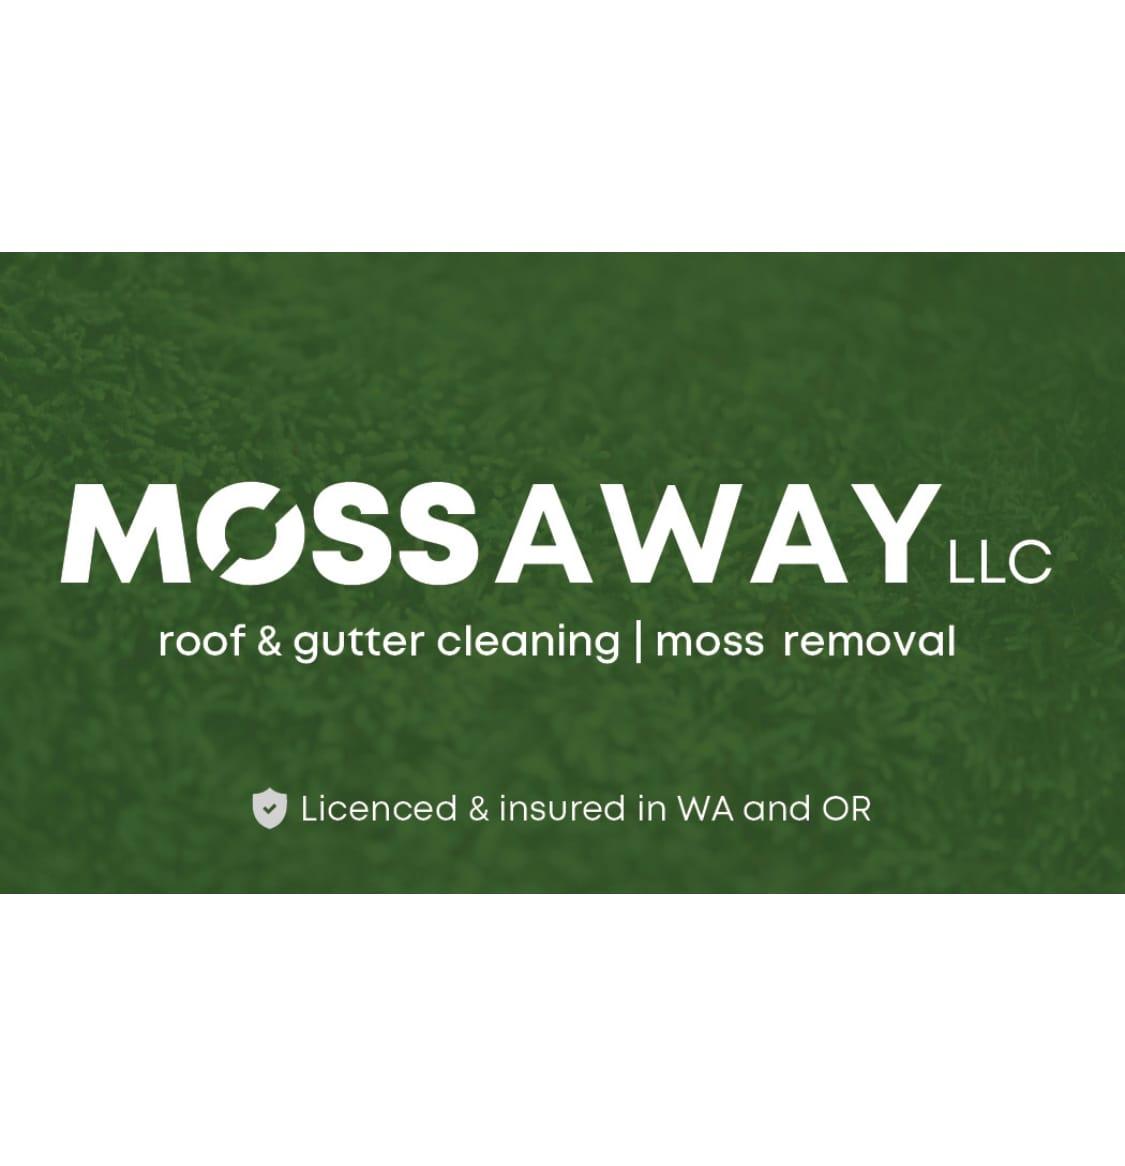 Mossaway logo